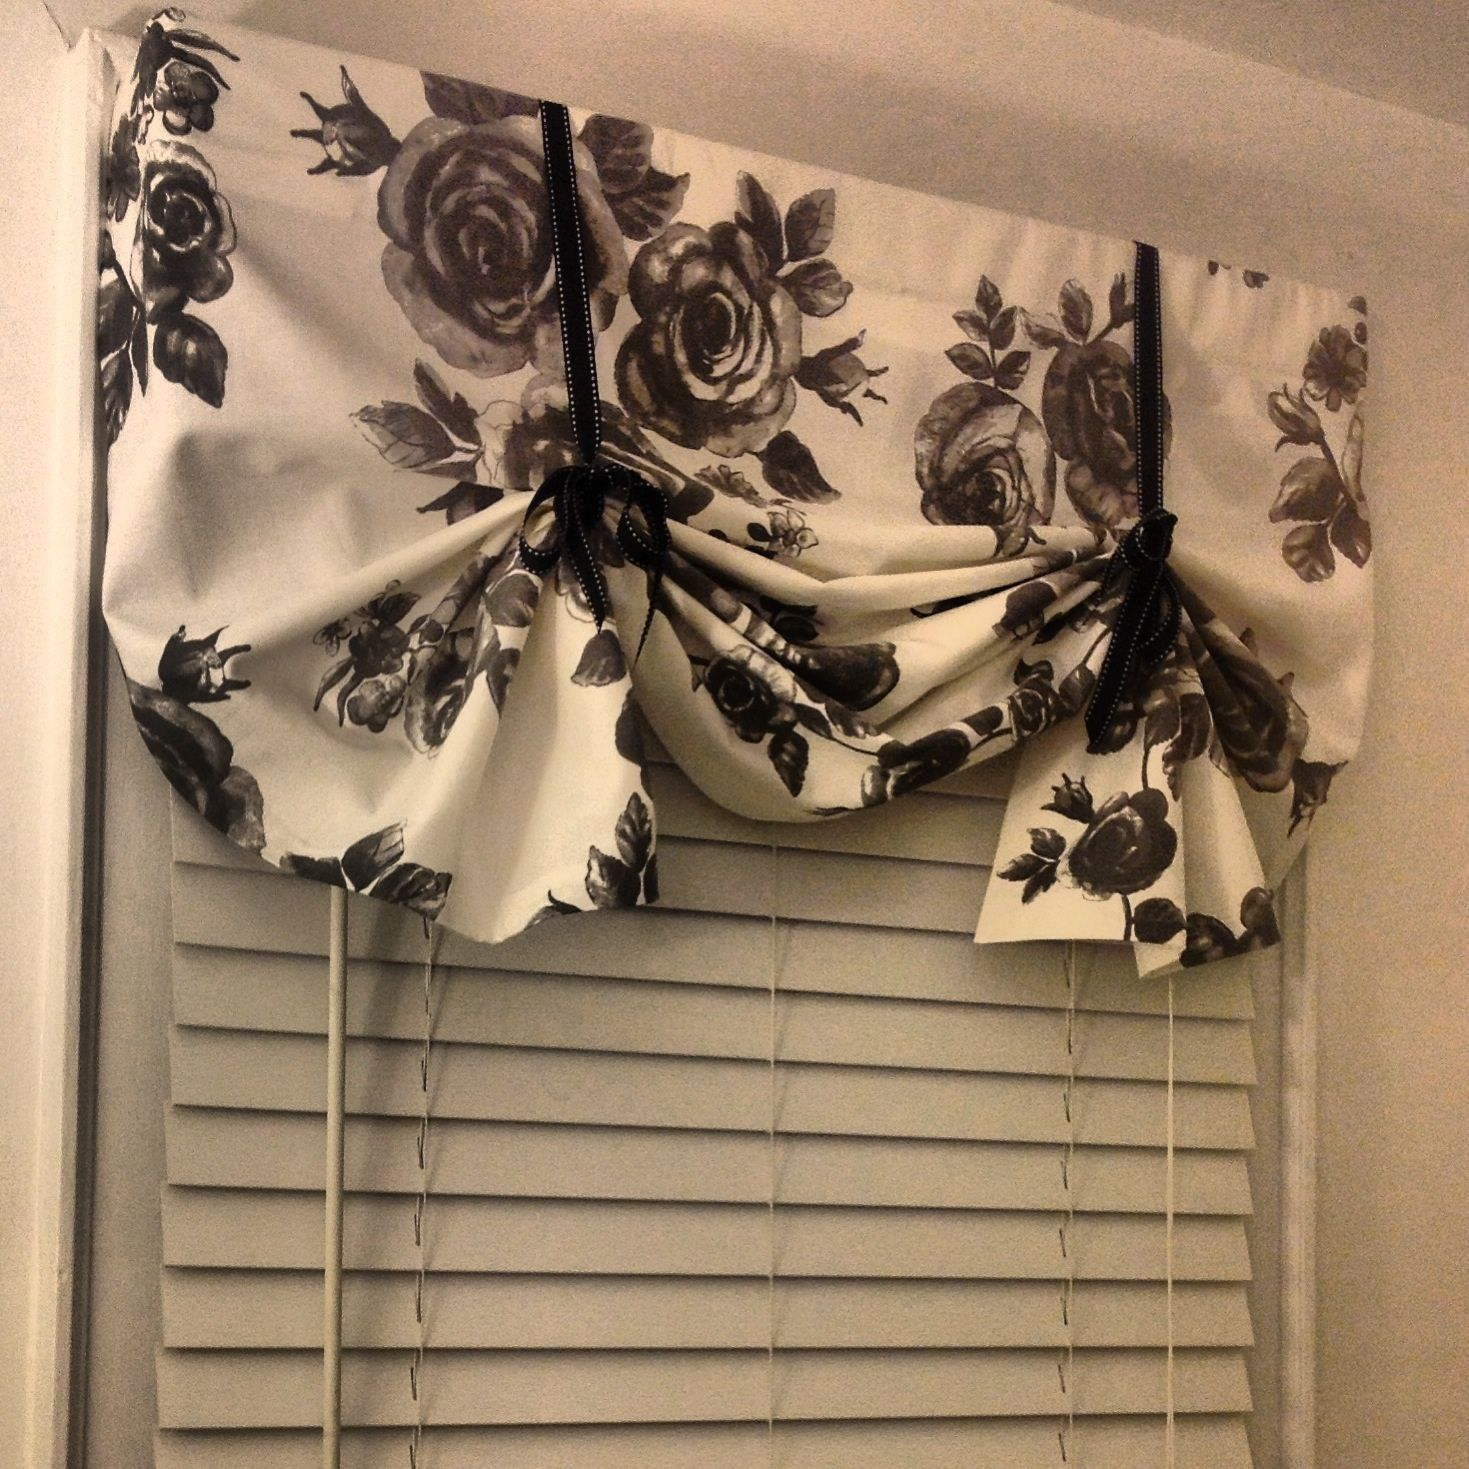 No curtain window ideas   budgetfriendly nosew diy curtains ideas  diy curtains curtain